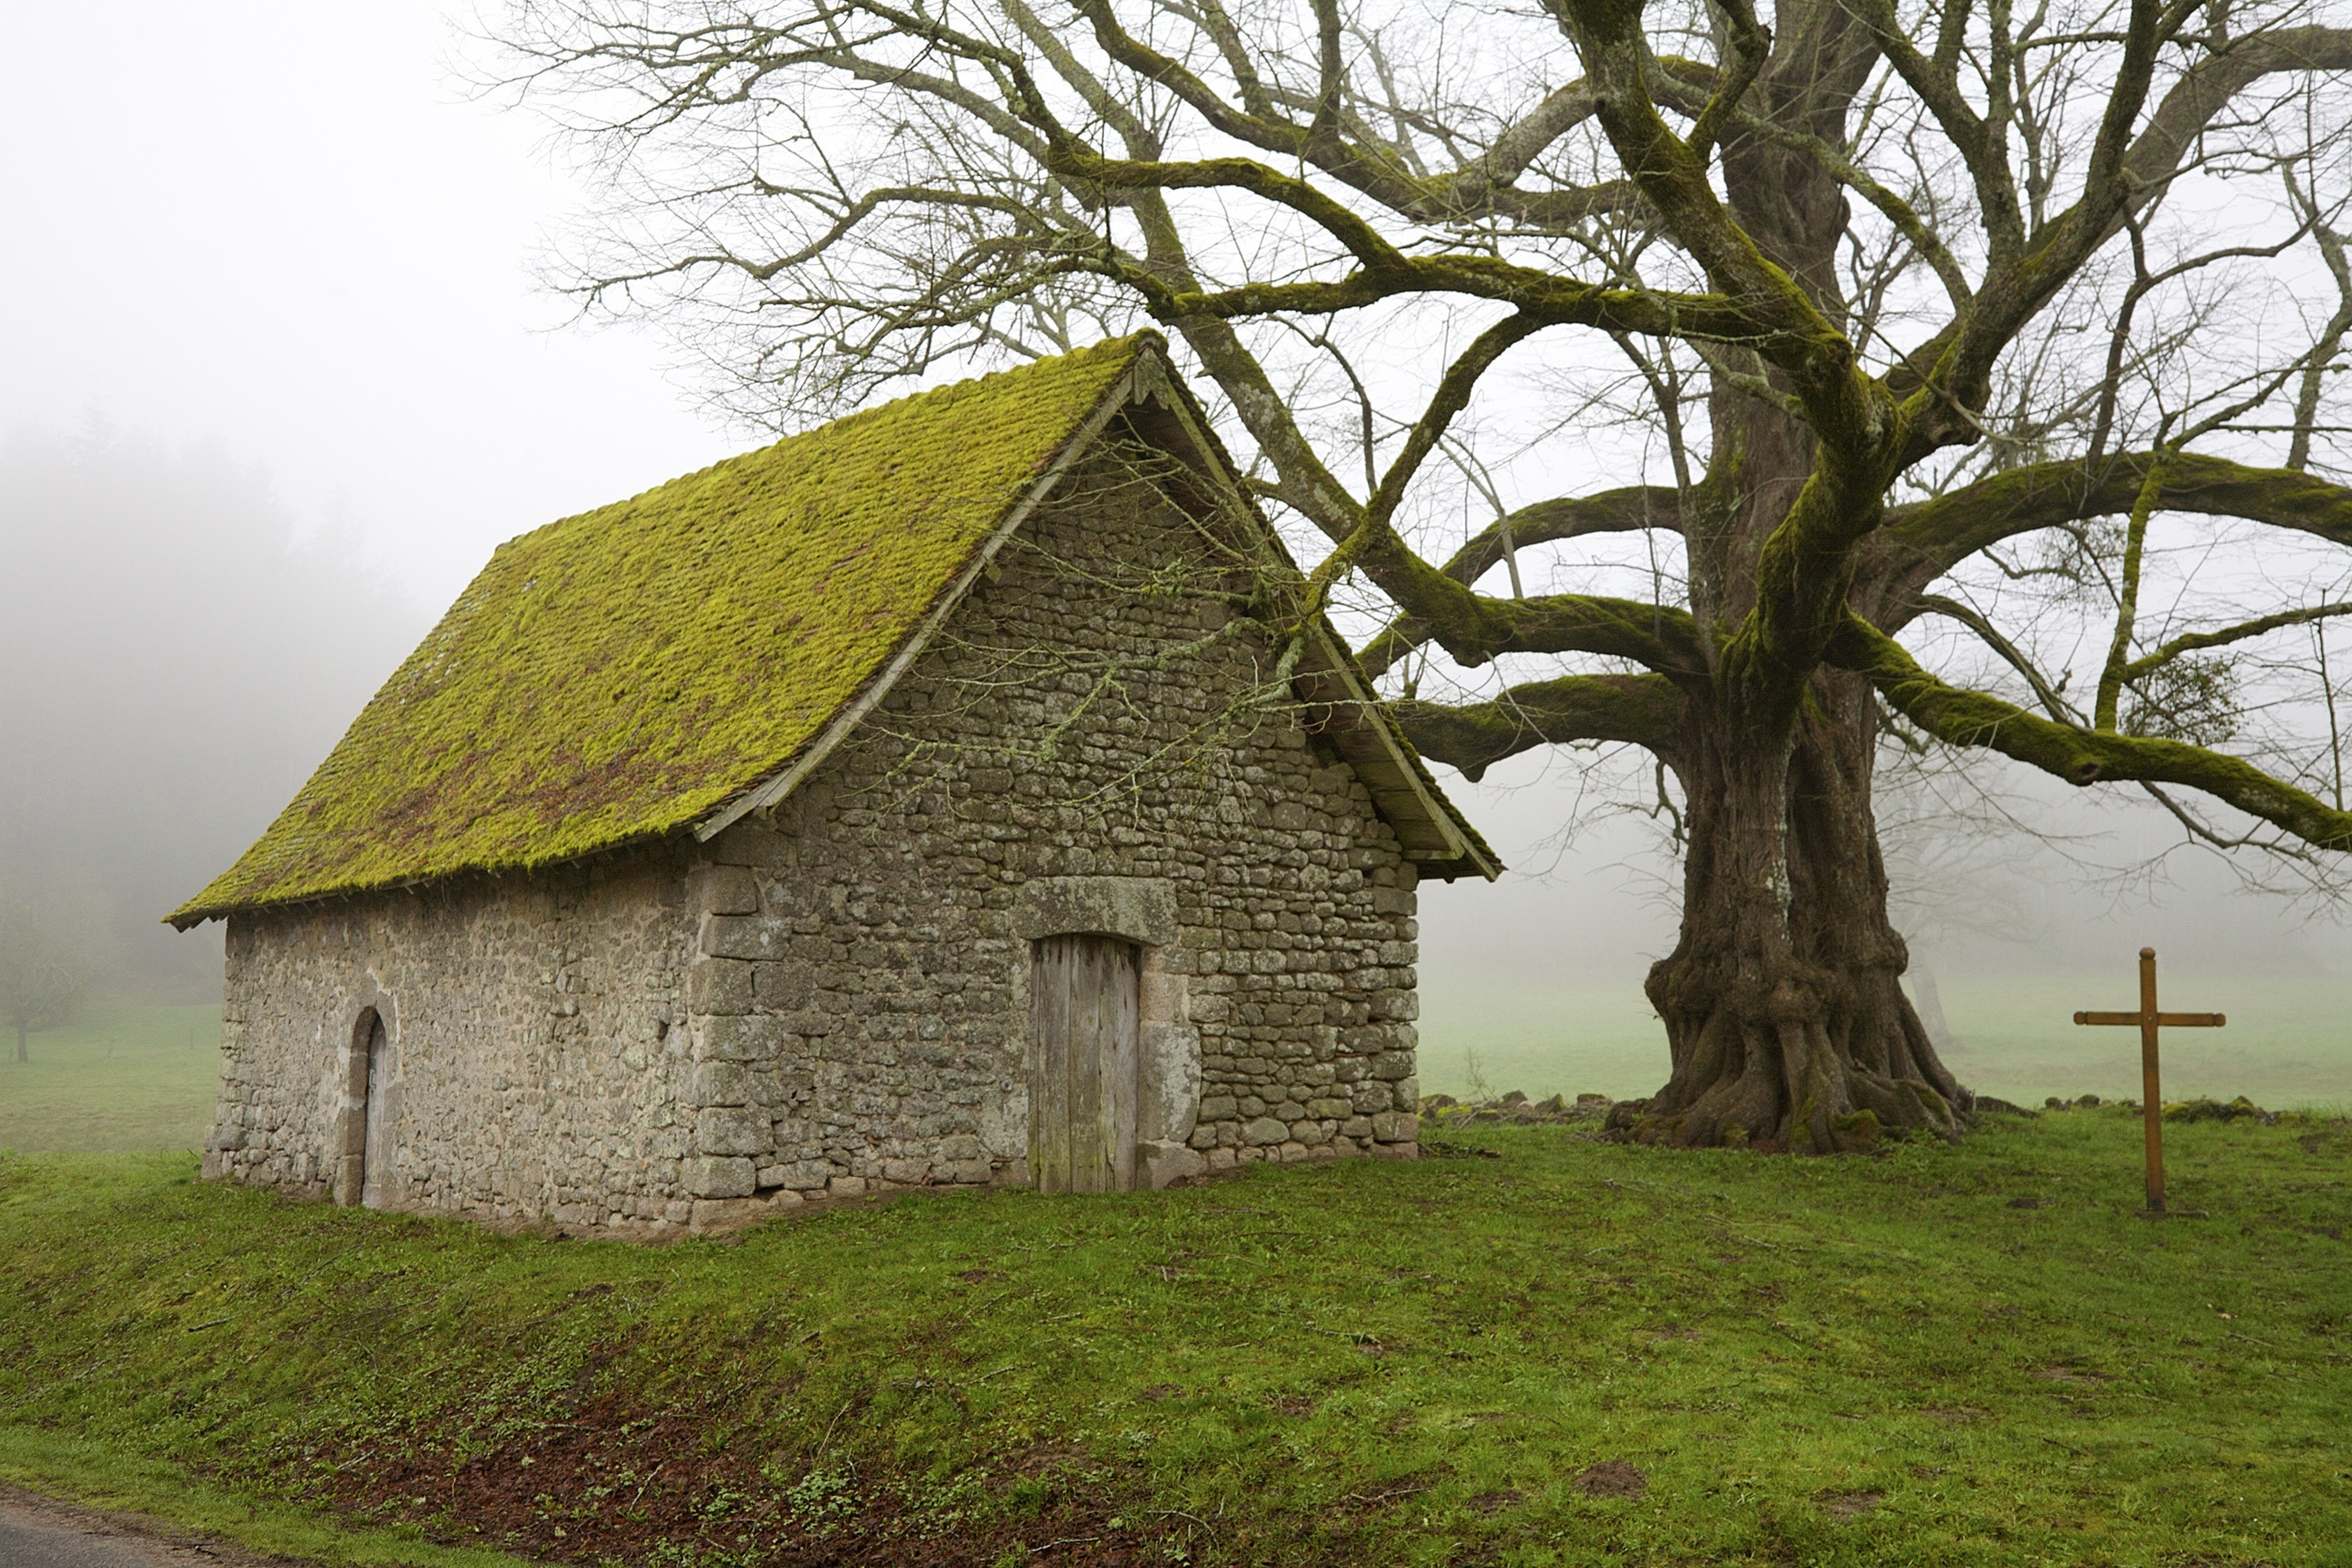 Creuse, France